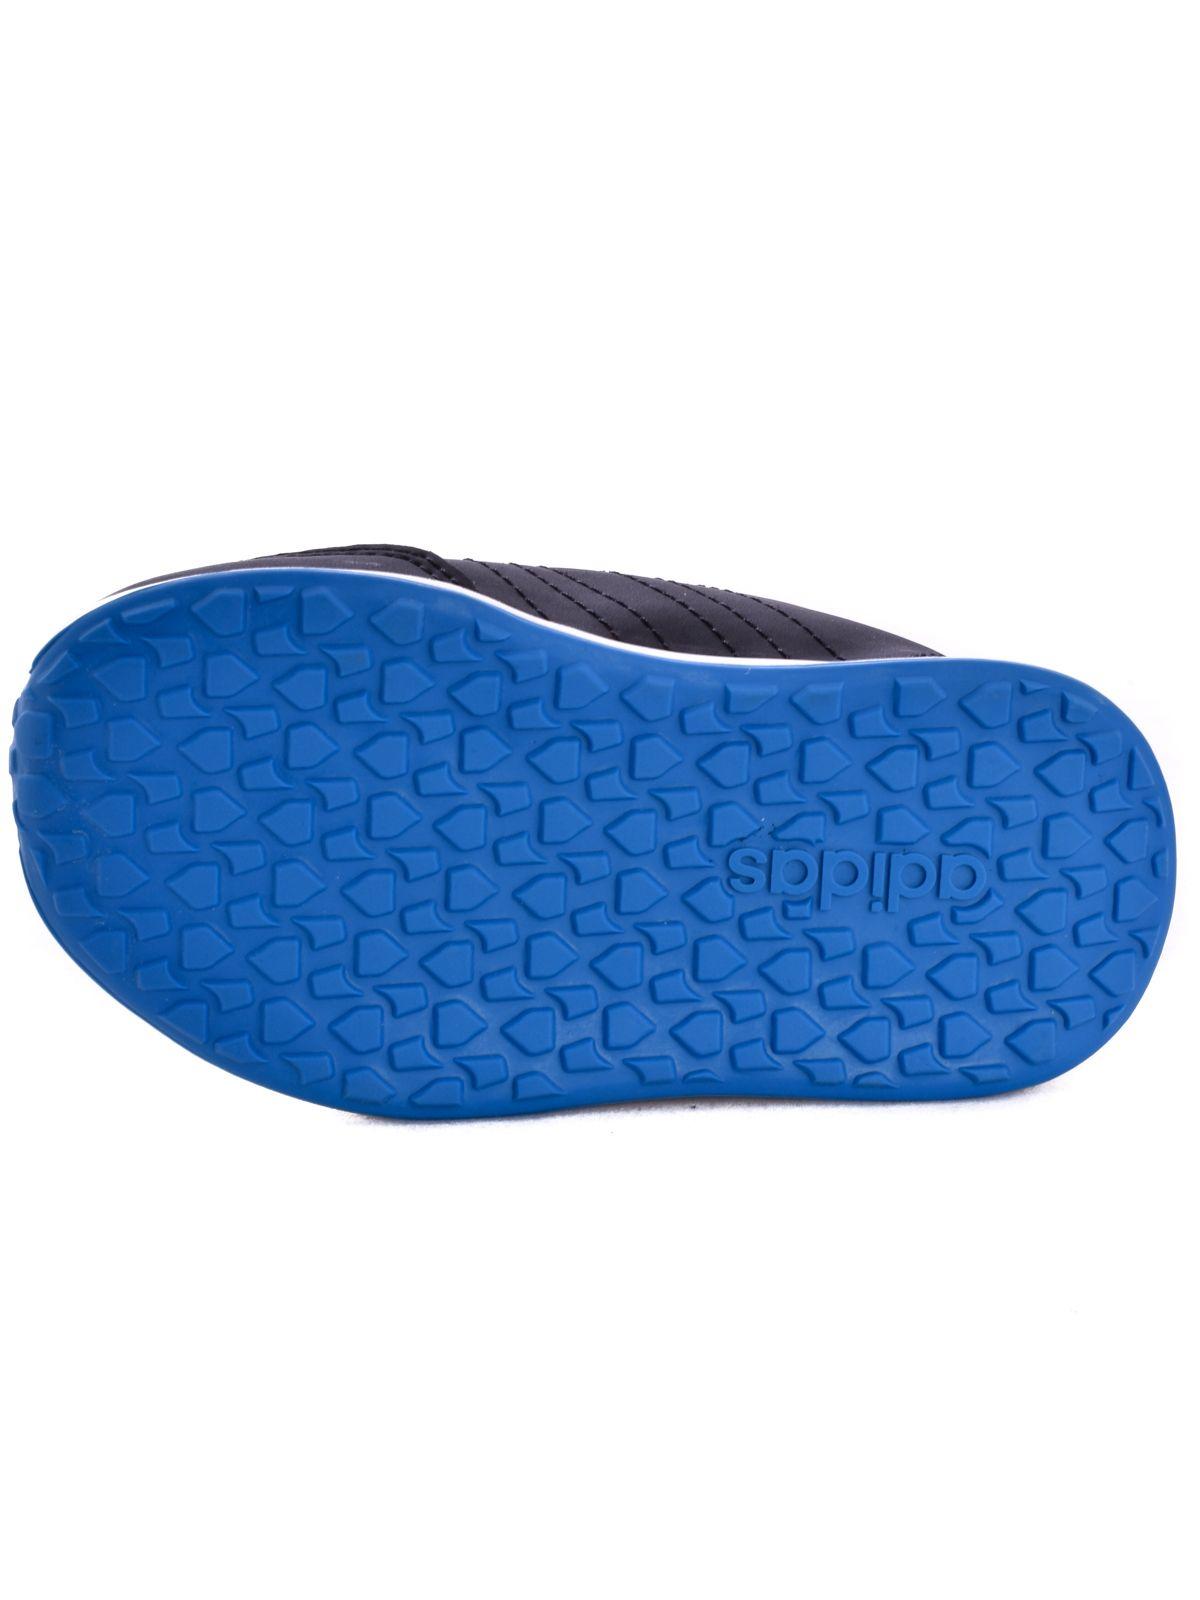 Adidas bébi fiú cipő VS SWITCH 2 CMF INF